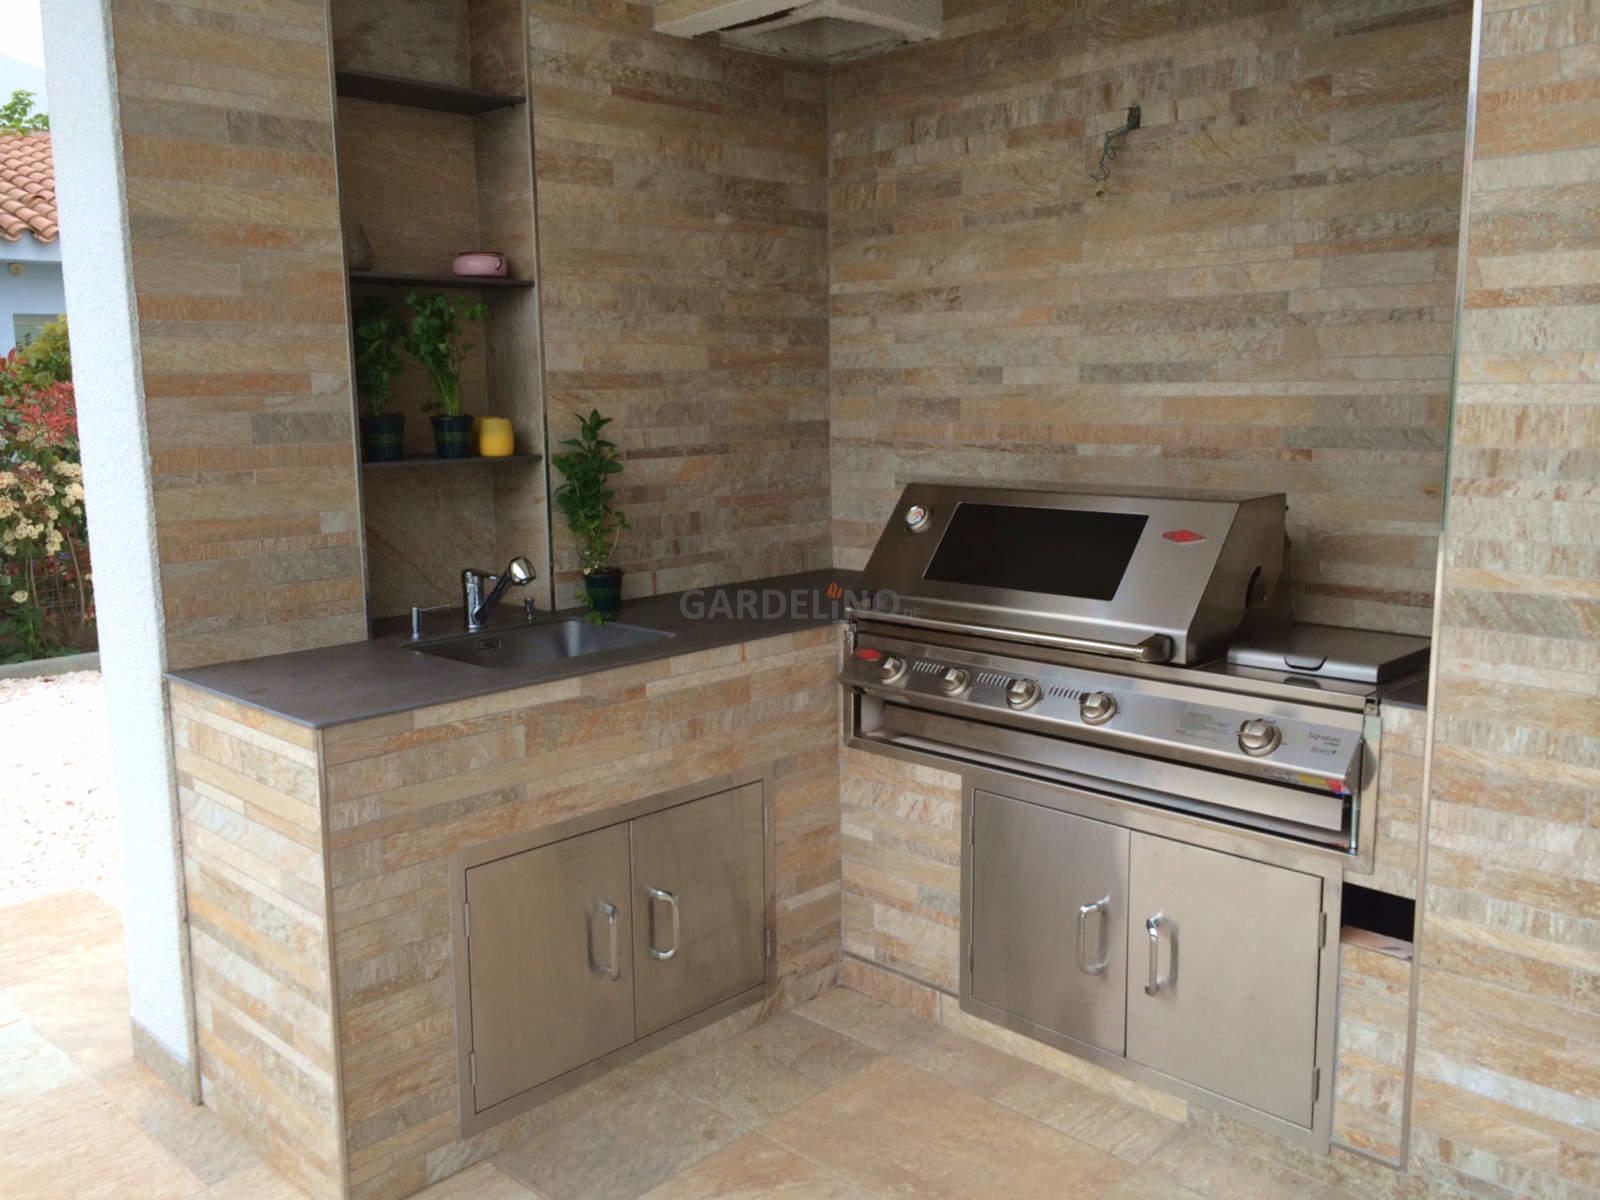 Weber Grill In Outdoor Küche Integrieren : Weber gasgrill outdoor küche grillplatte outdoor küche